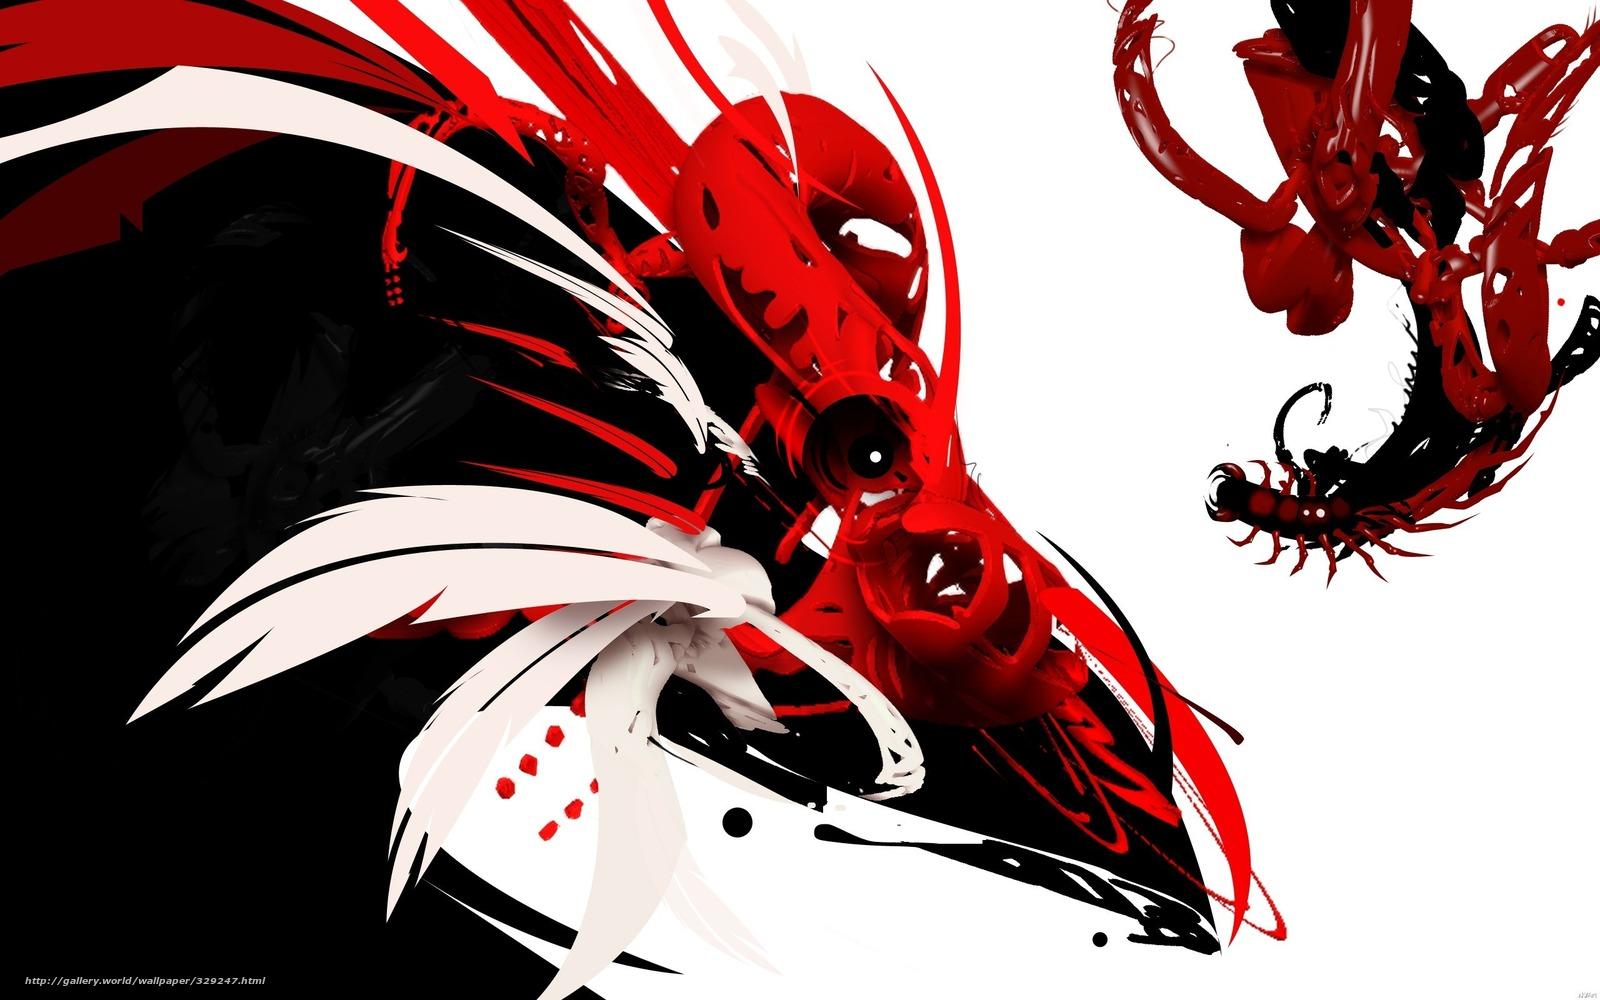 Download wallpaper red black White bird desktop wallpaper in 1600x1000